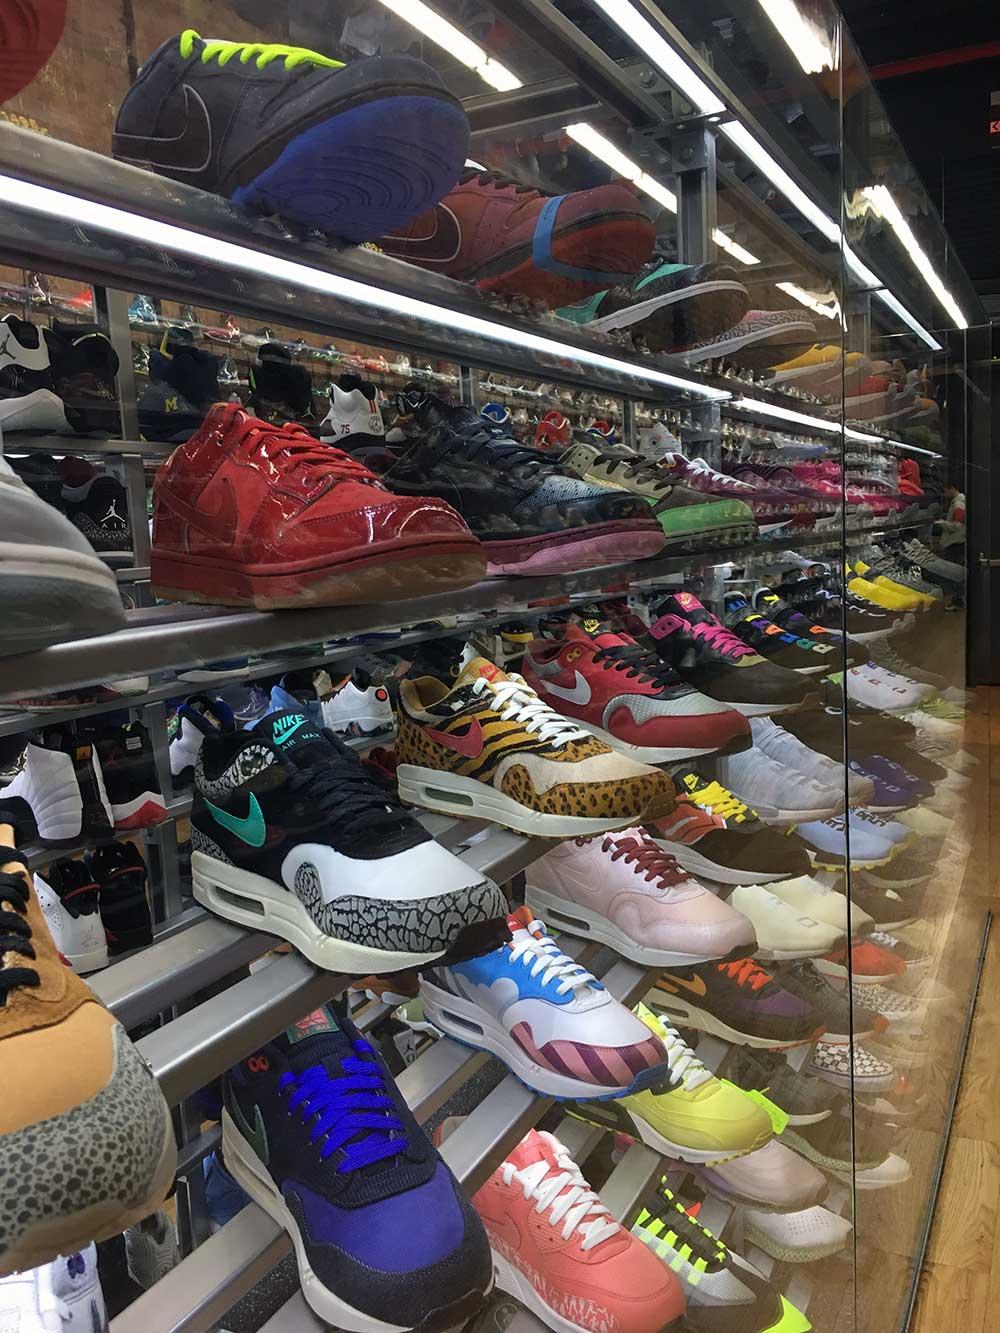 bfc01f4b324 Back to the Future Nikes zijn de duurste Nike sneakers - JFK